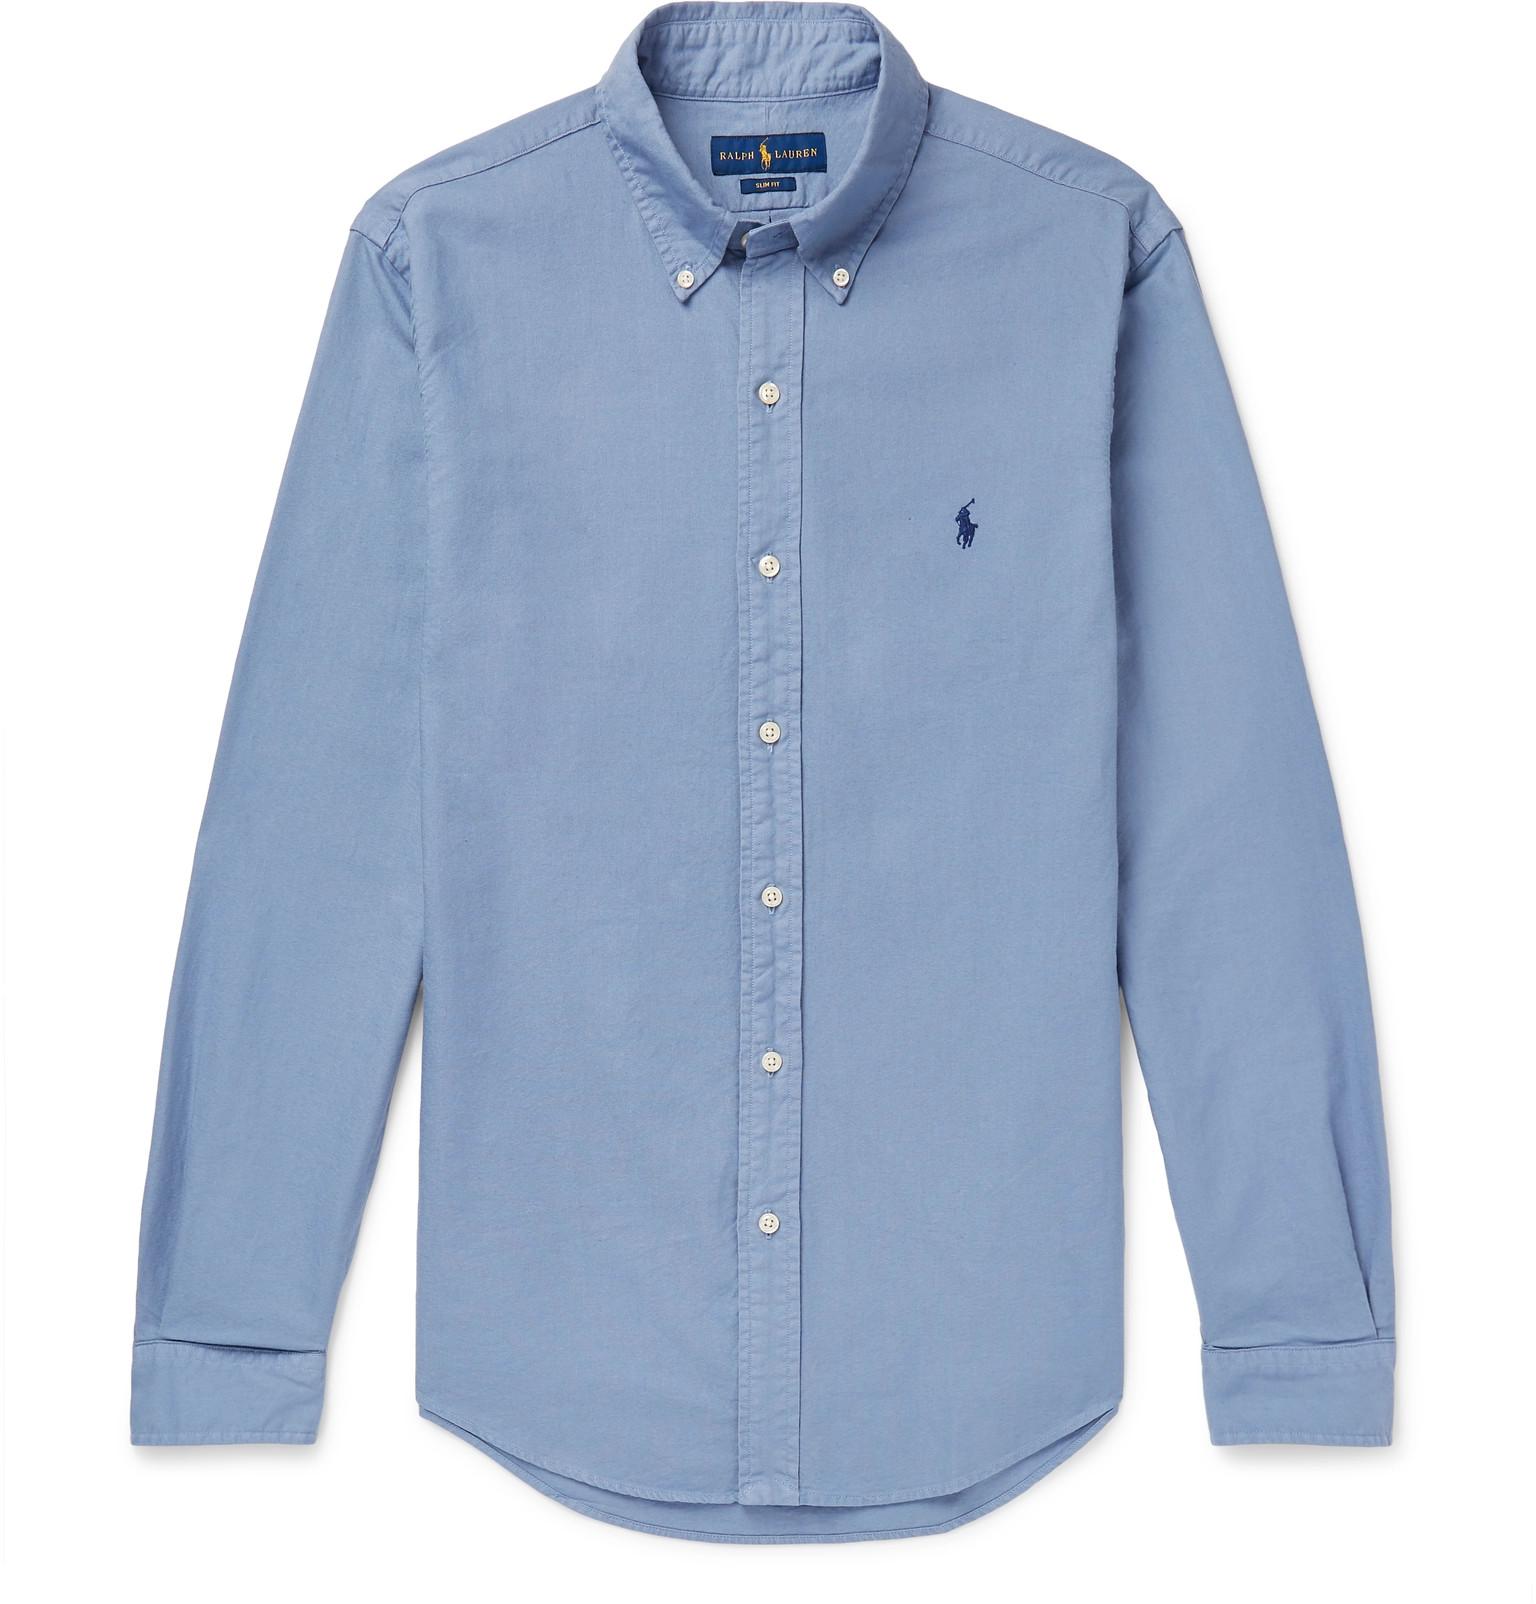 5a1dc58825e Polo Ralph LaurenSlim-Fit Button-Down Collar Garment-Dyed Cotton Oxford  Shirt